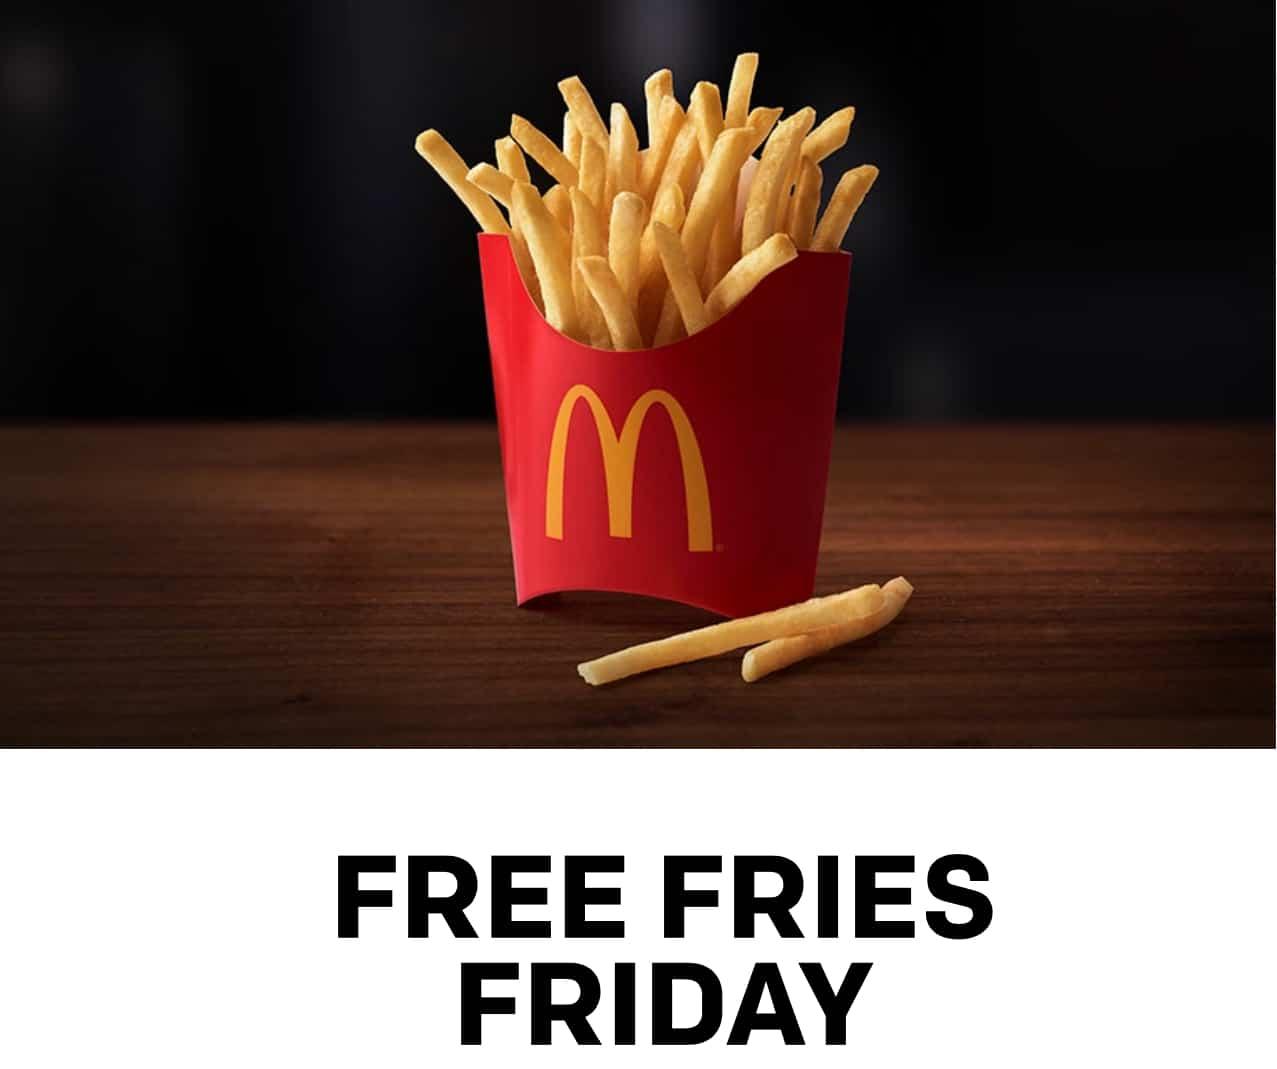 McDonald's Fries Friday